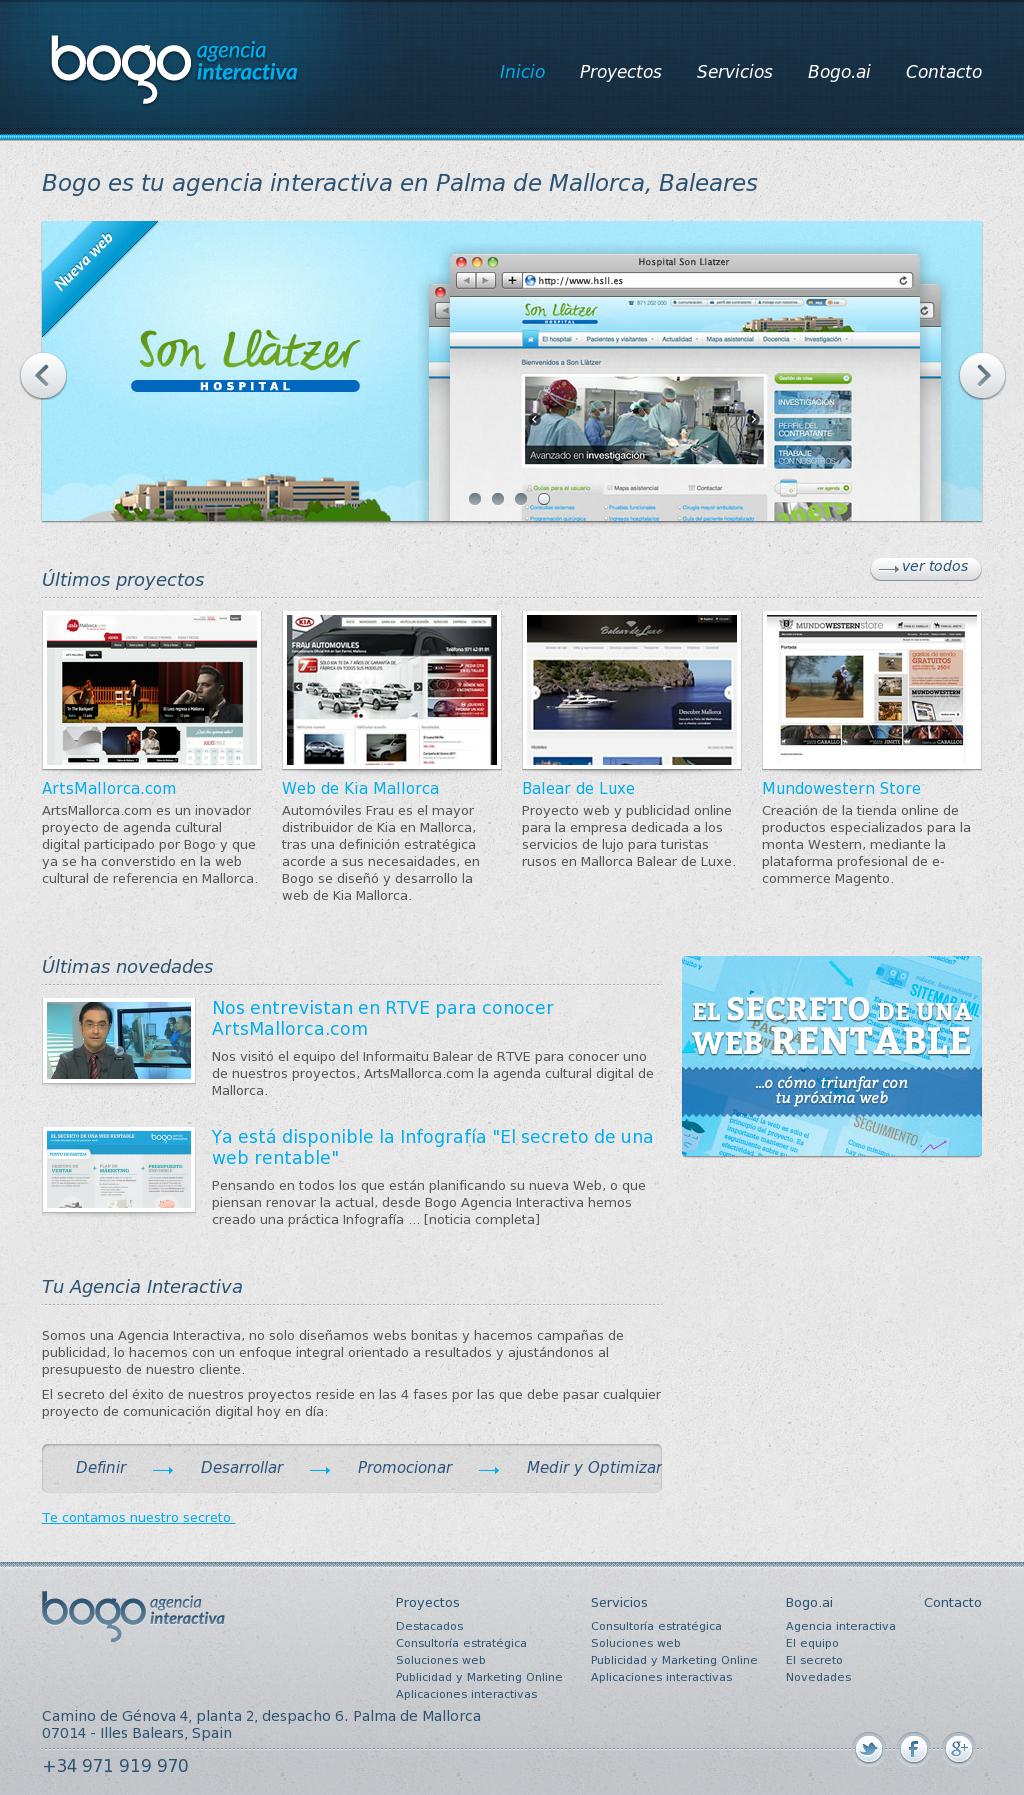 Bogo - Agencia Interactiva Competitors, Revenue and Employees ...